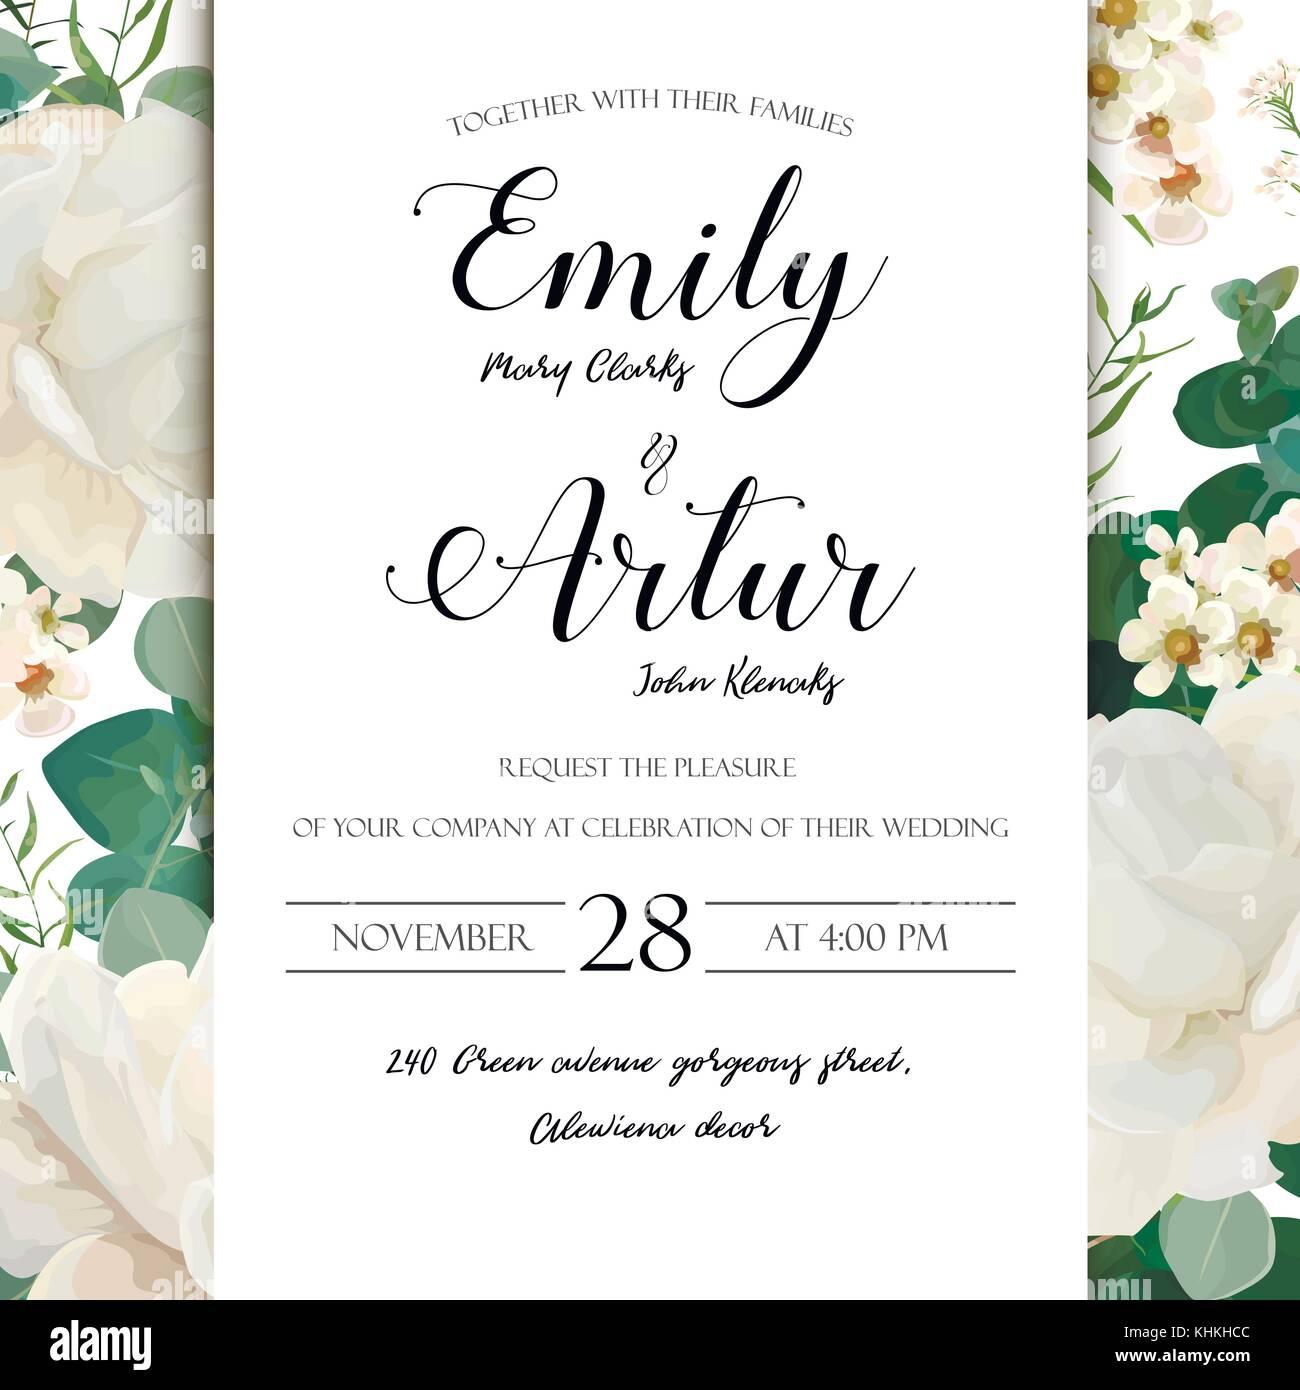 Floral Wedding Invitation save the date card elegant invite card ...